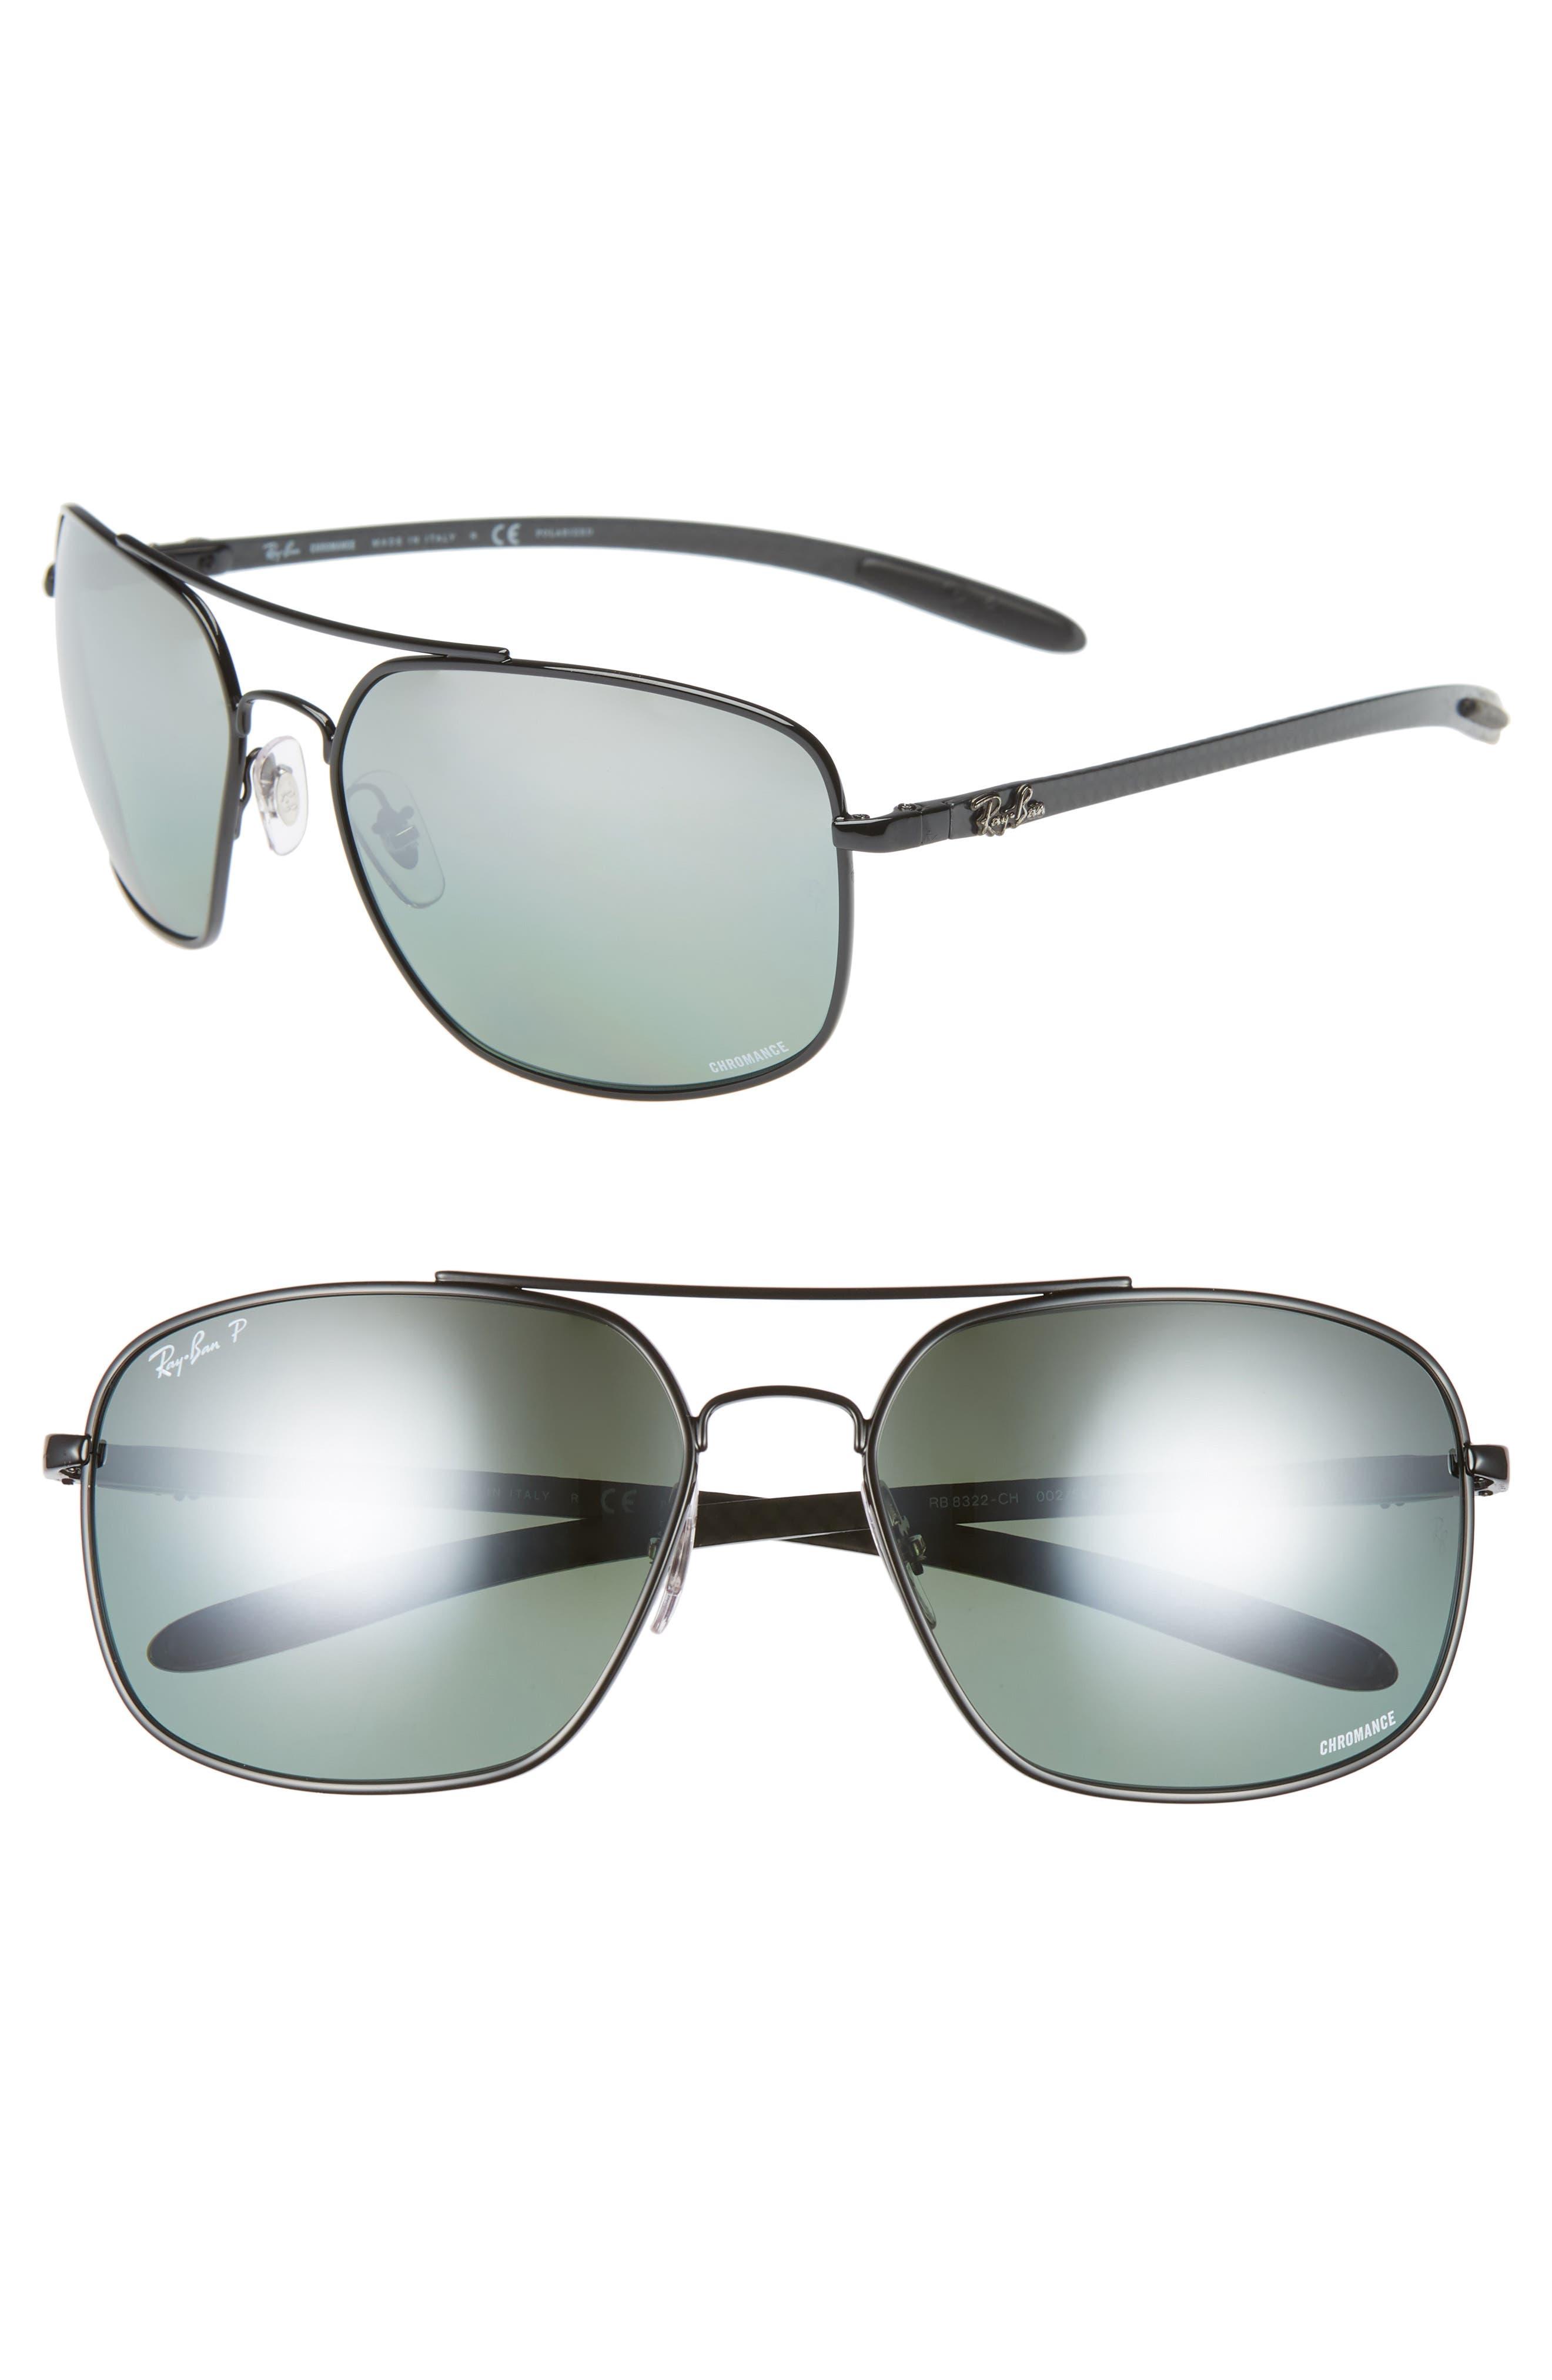 Ray-Ban 62Mm Polarized Square Sunglasses - Black